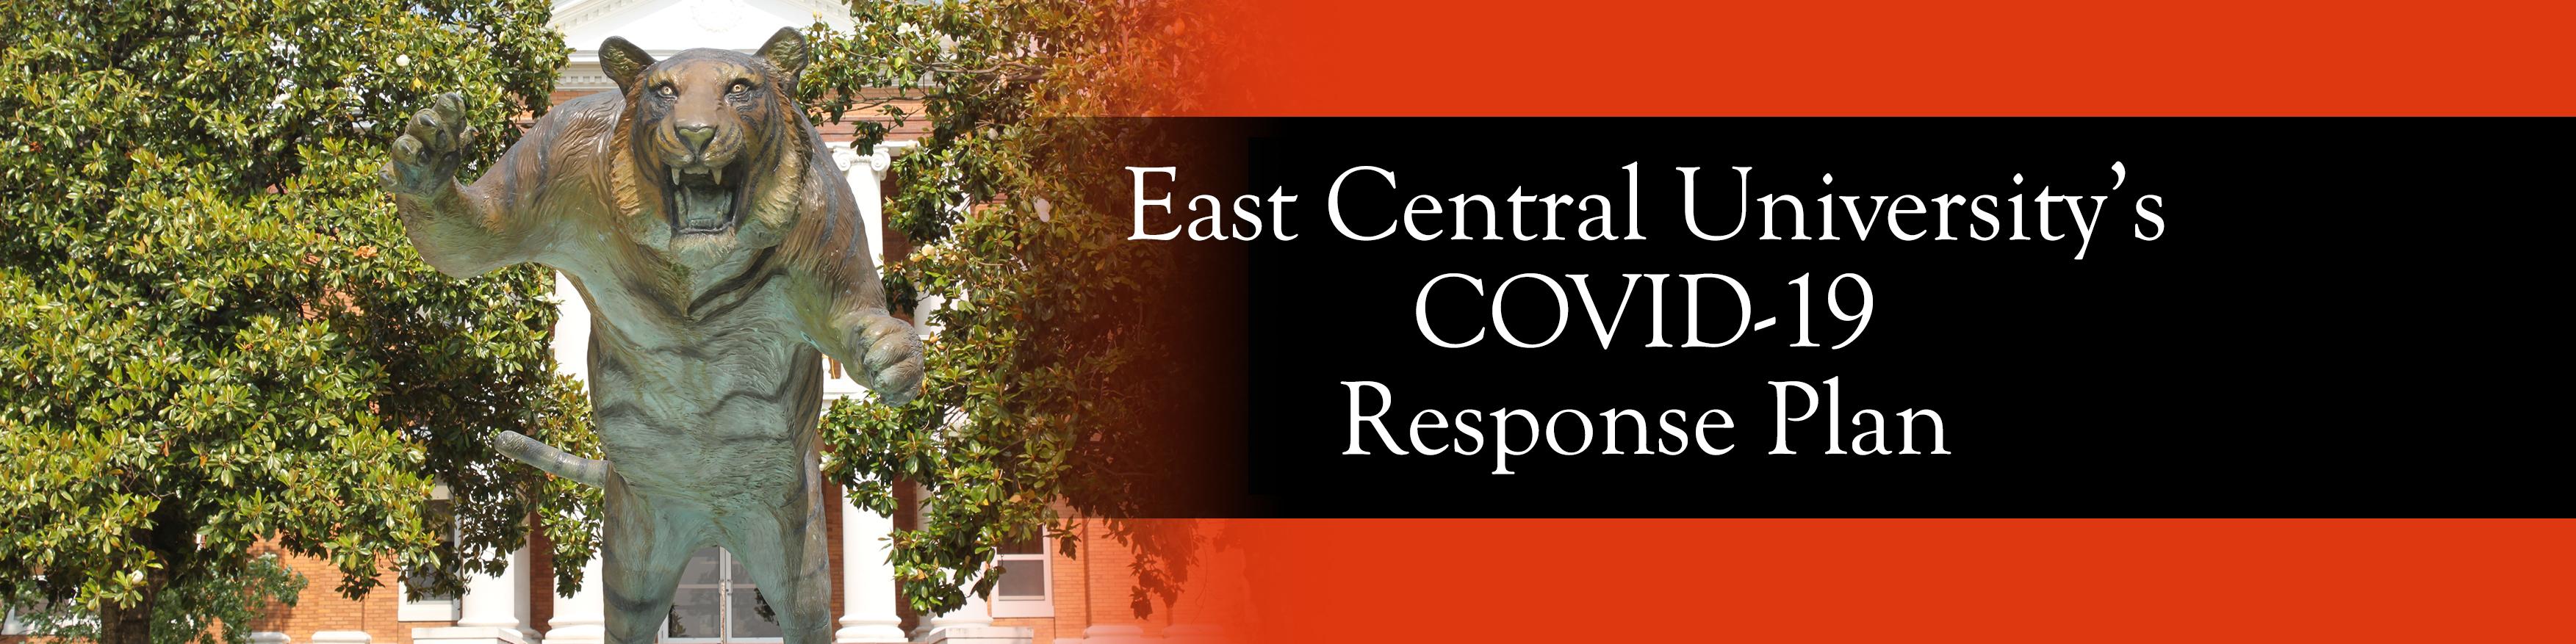 ECU COVID-19 Response